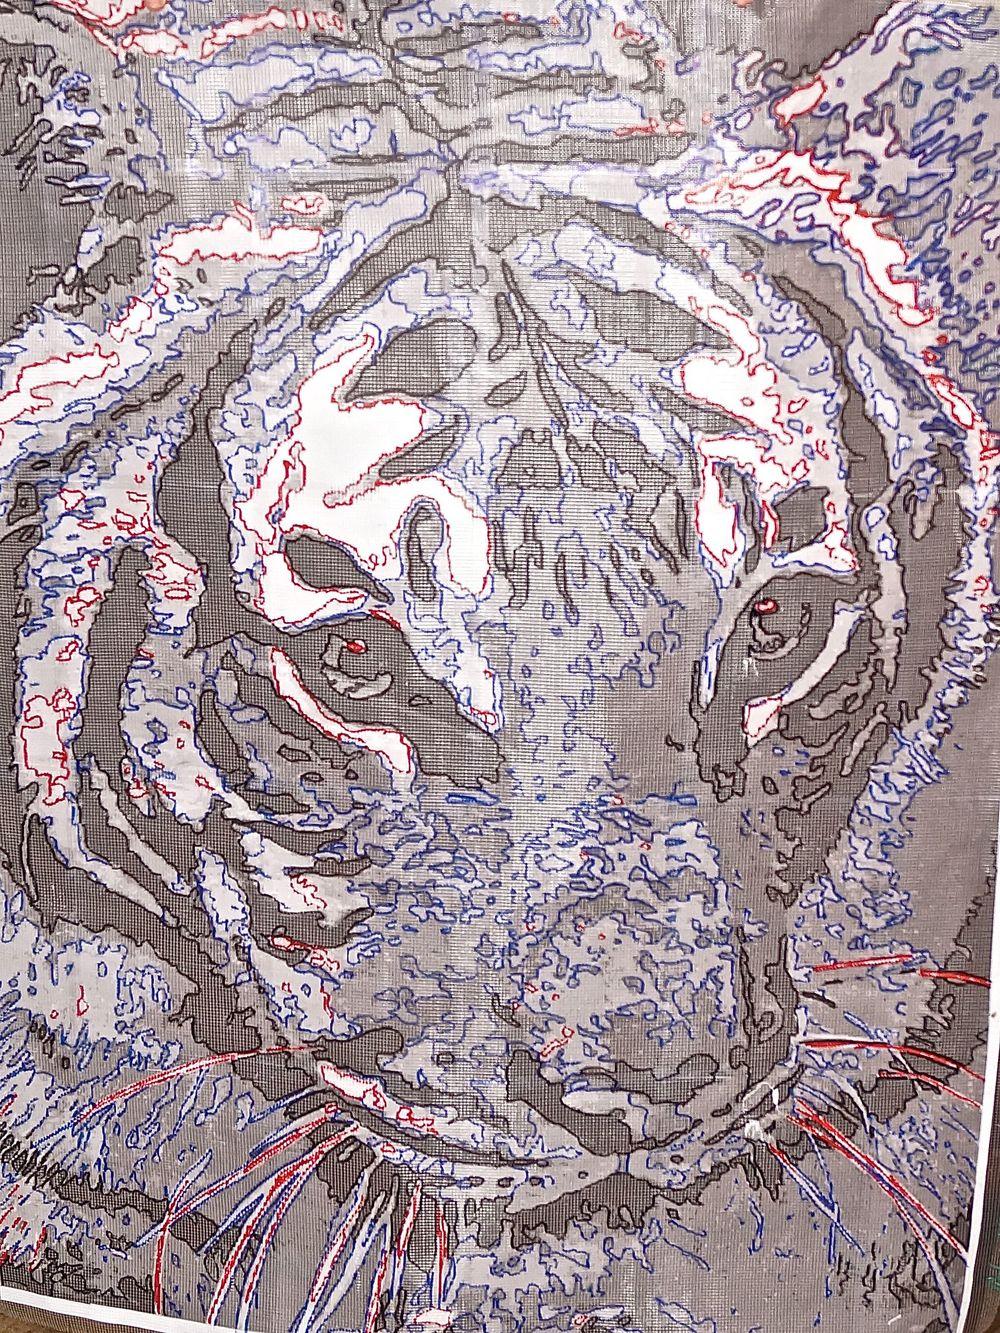 Satu the Tiger traced on grid fabric